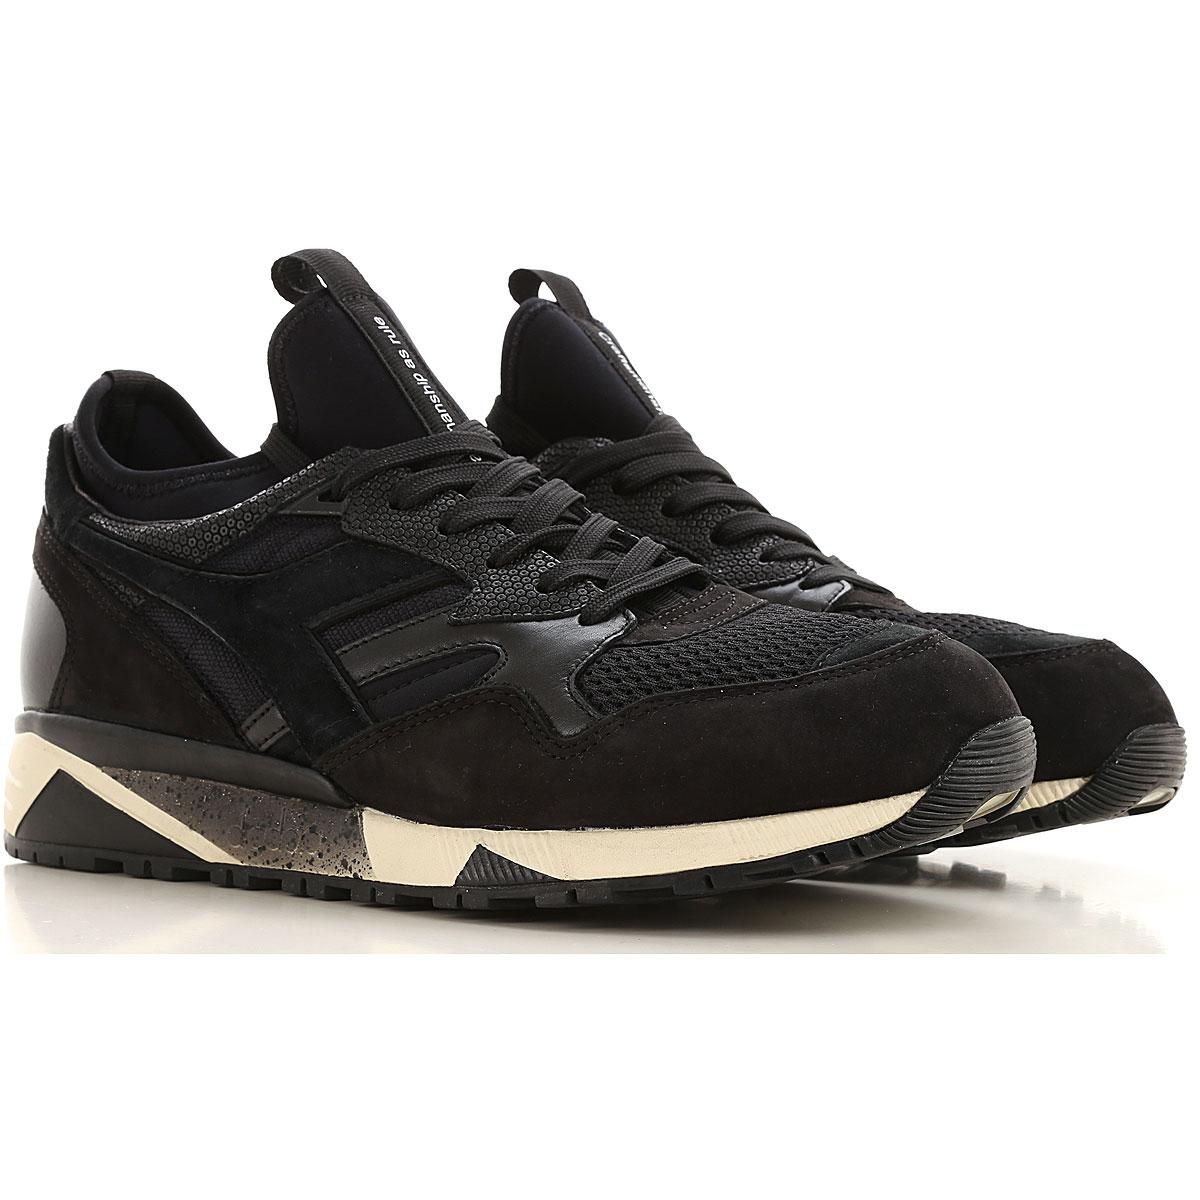 Diadora Sneakers for Men On Sale, Black, Leather, 2019, EU 39 - UK 6 - US 6.5 EU 42 - UK 8 - US 8.5